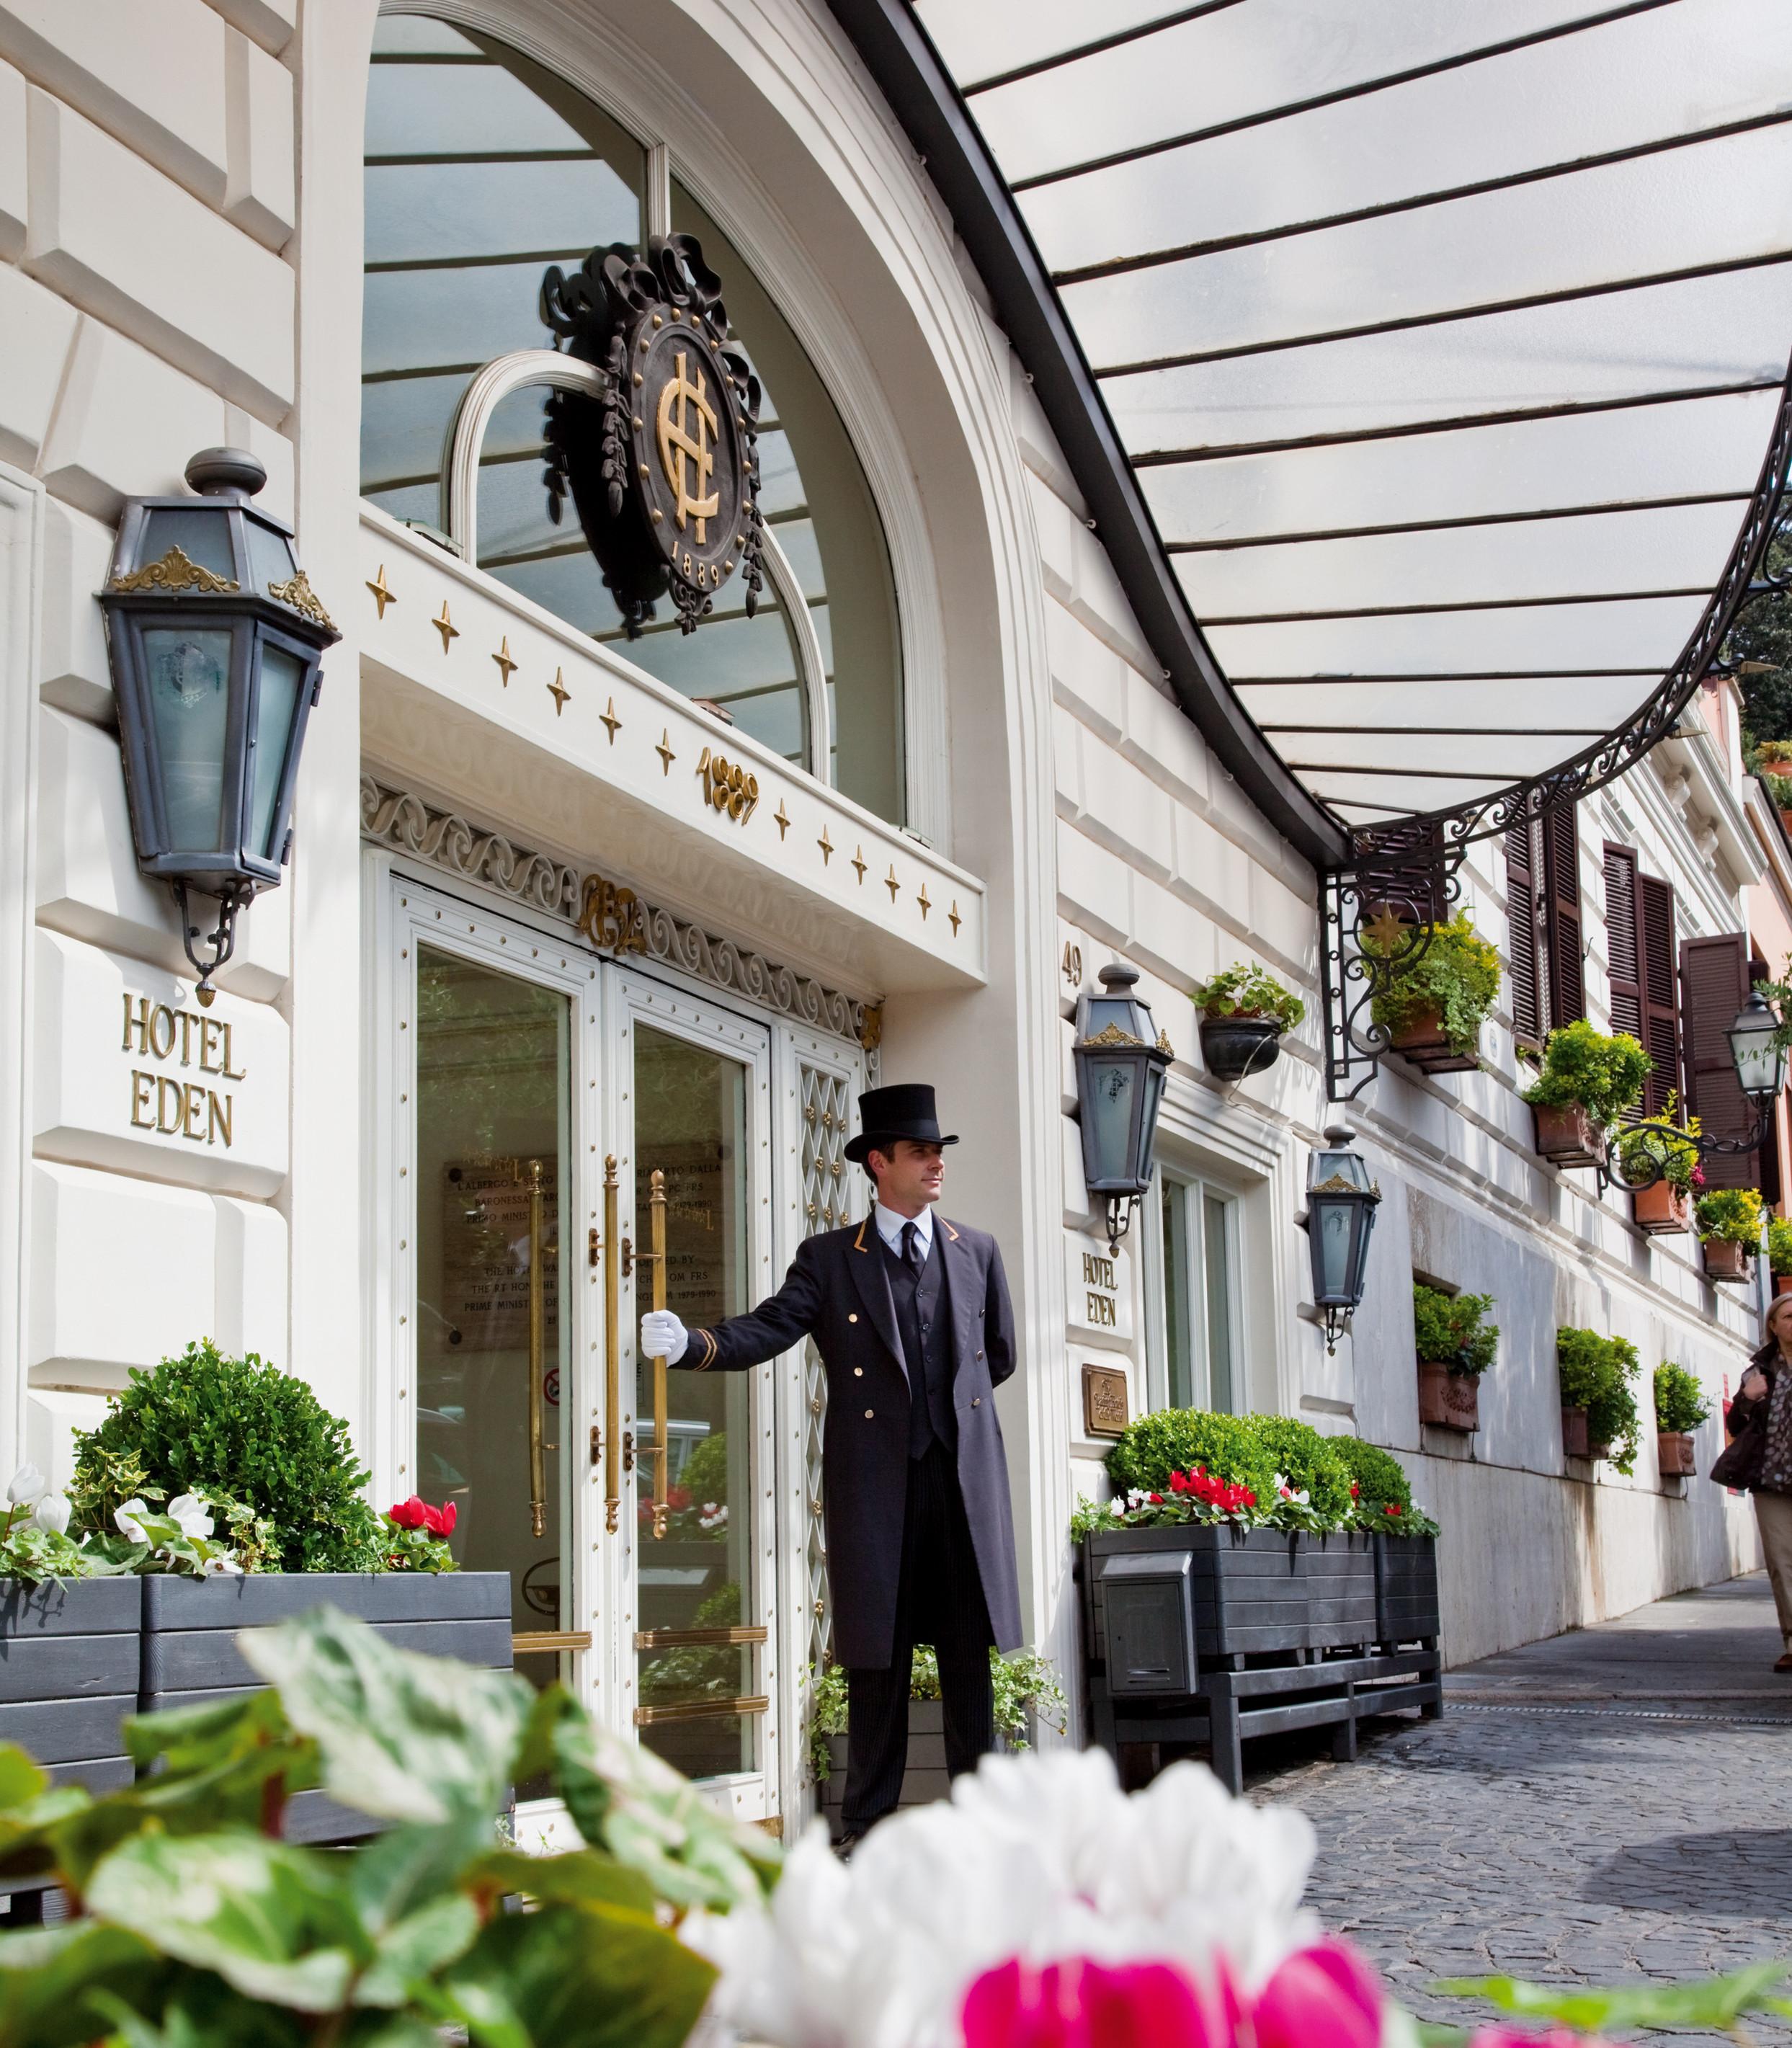 Dorchester collection imponente restyling per l hotel - Hotel eden en roma ...